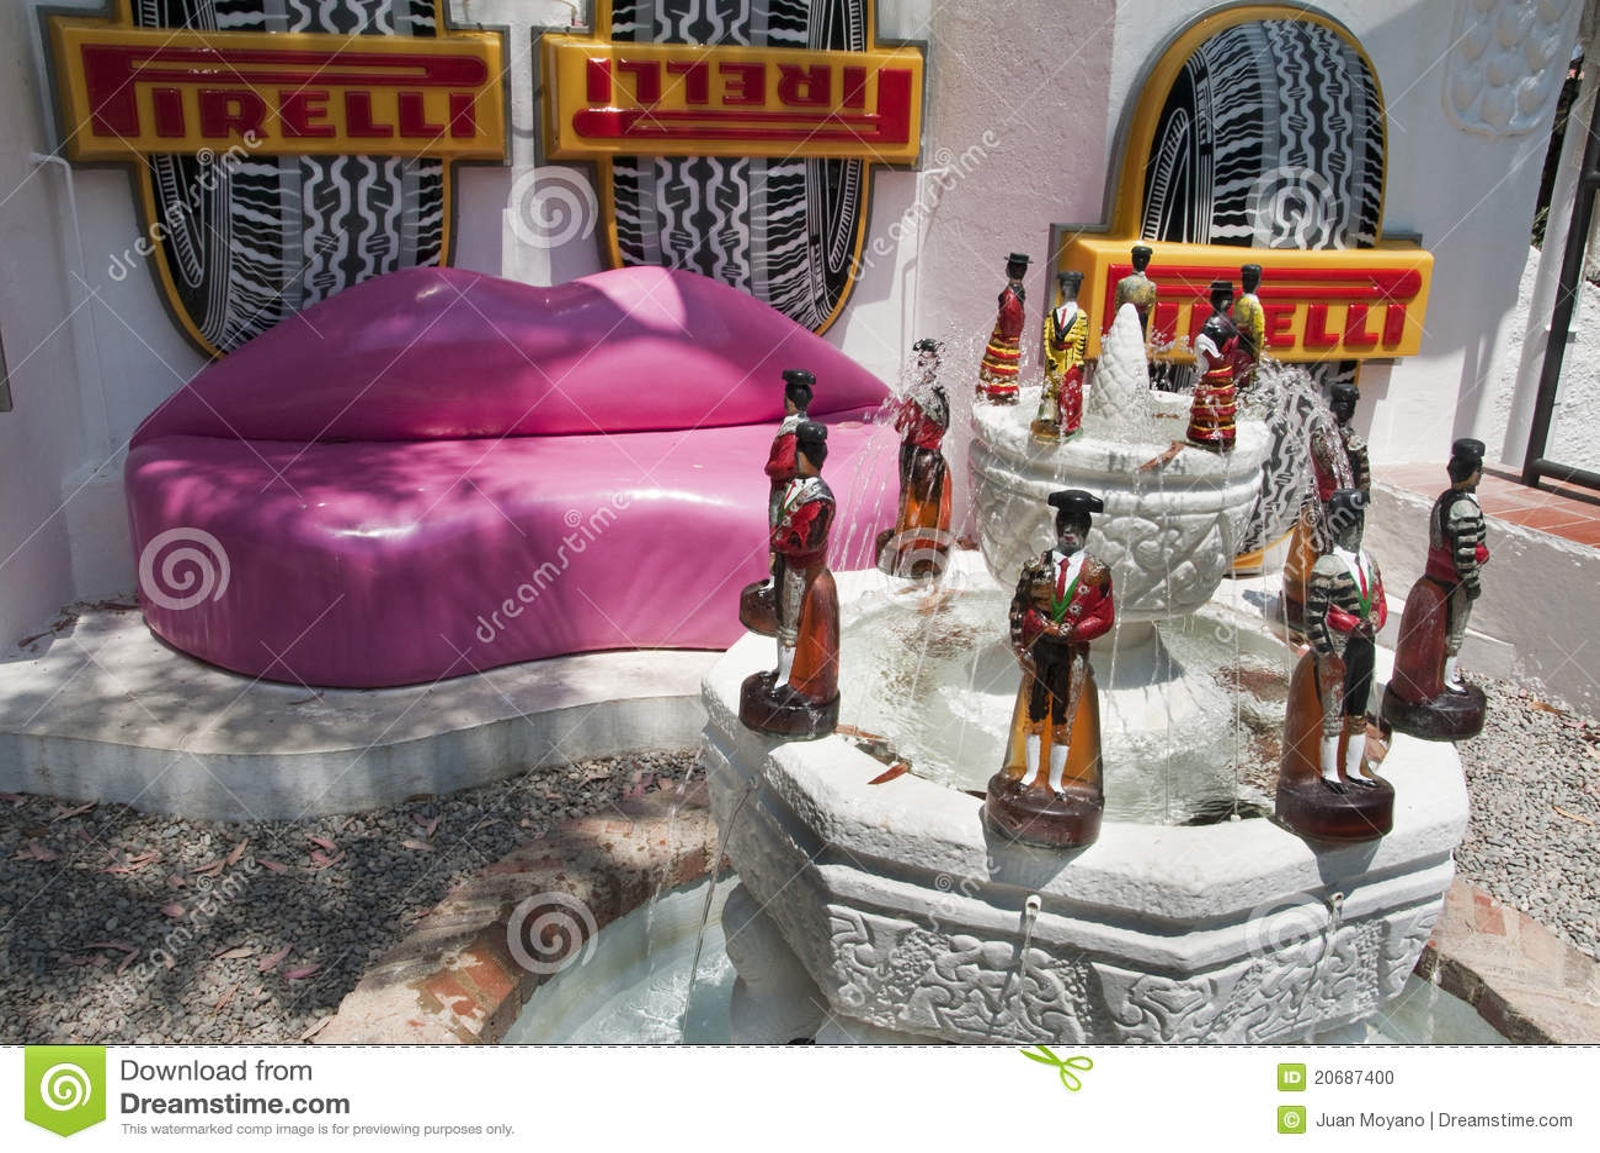 HouseMuseum Salvador Dali In Cadaques Spain Editorial